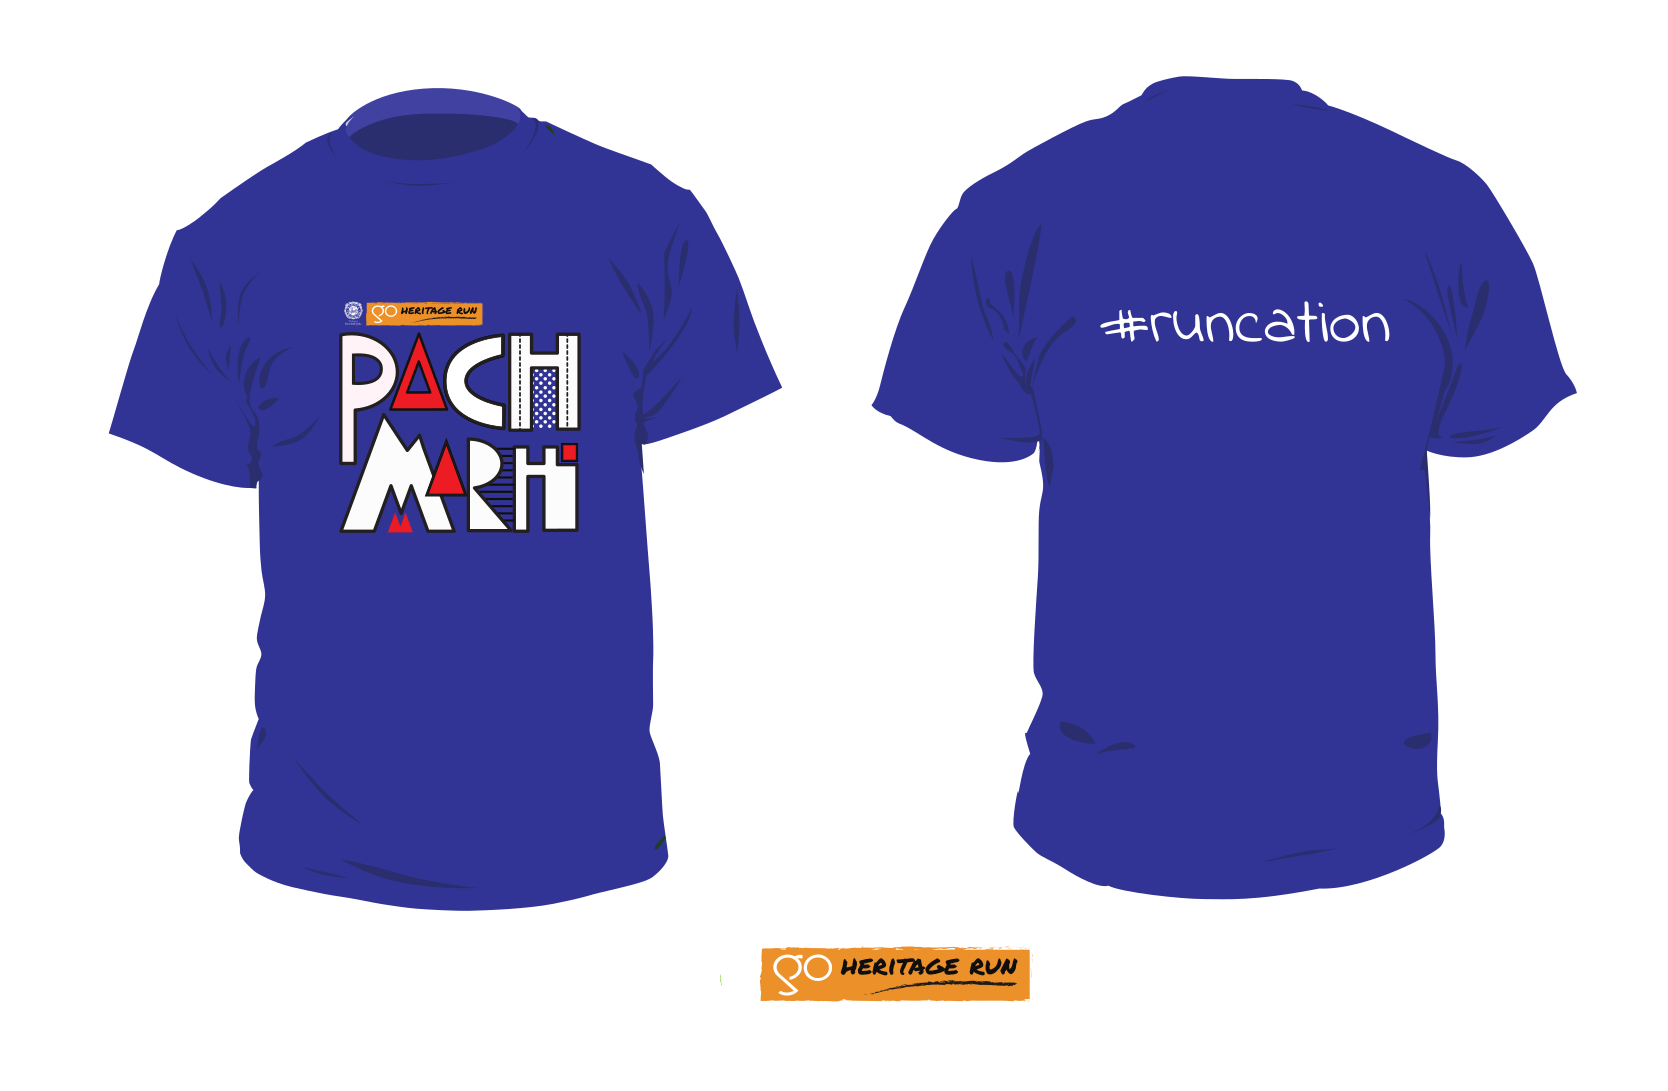 Go Heritage Run Pachmarhi 2020 tshirt